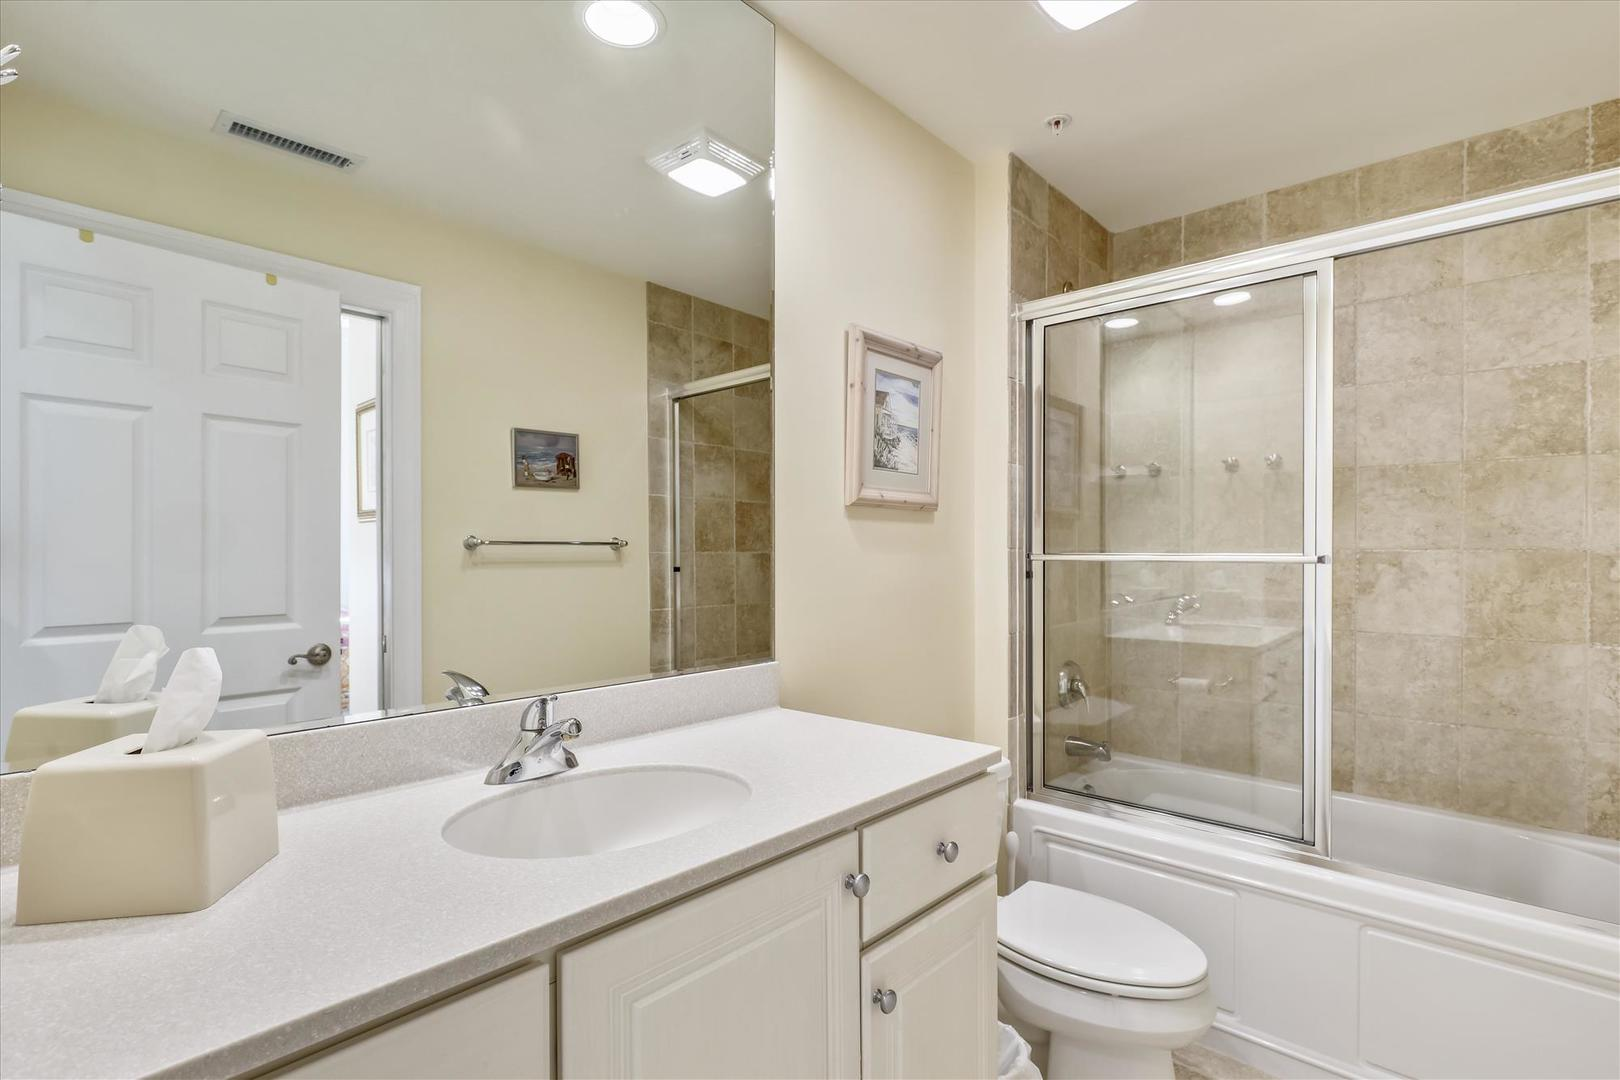 South Beach 304 - Bathroom 2